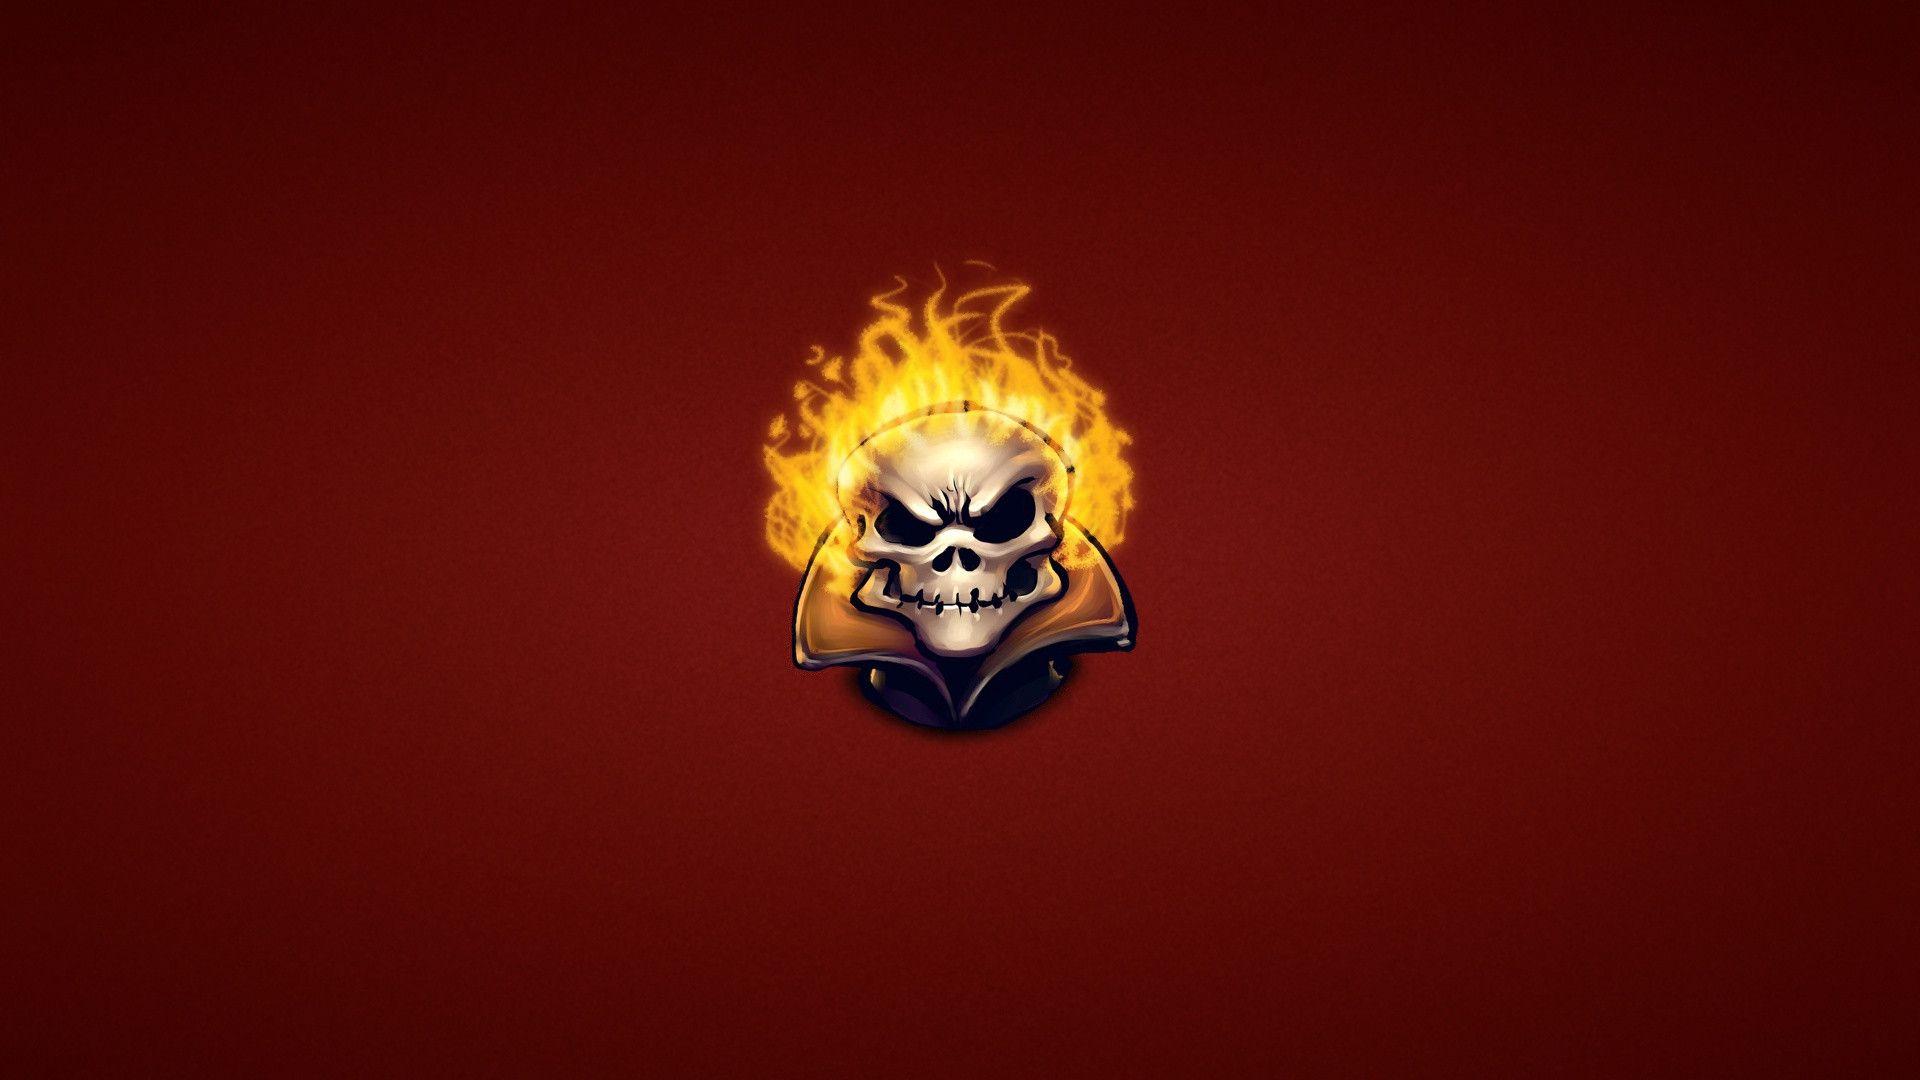 Ghost Rider Skull Wallpapers - Wallpaper Cave